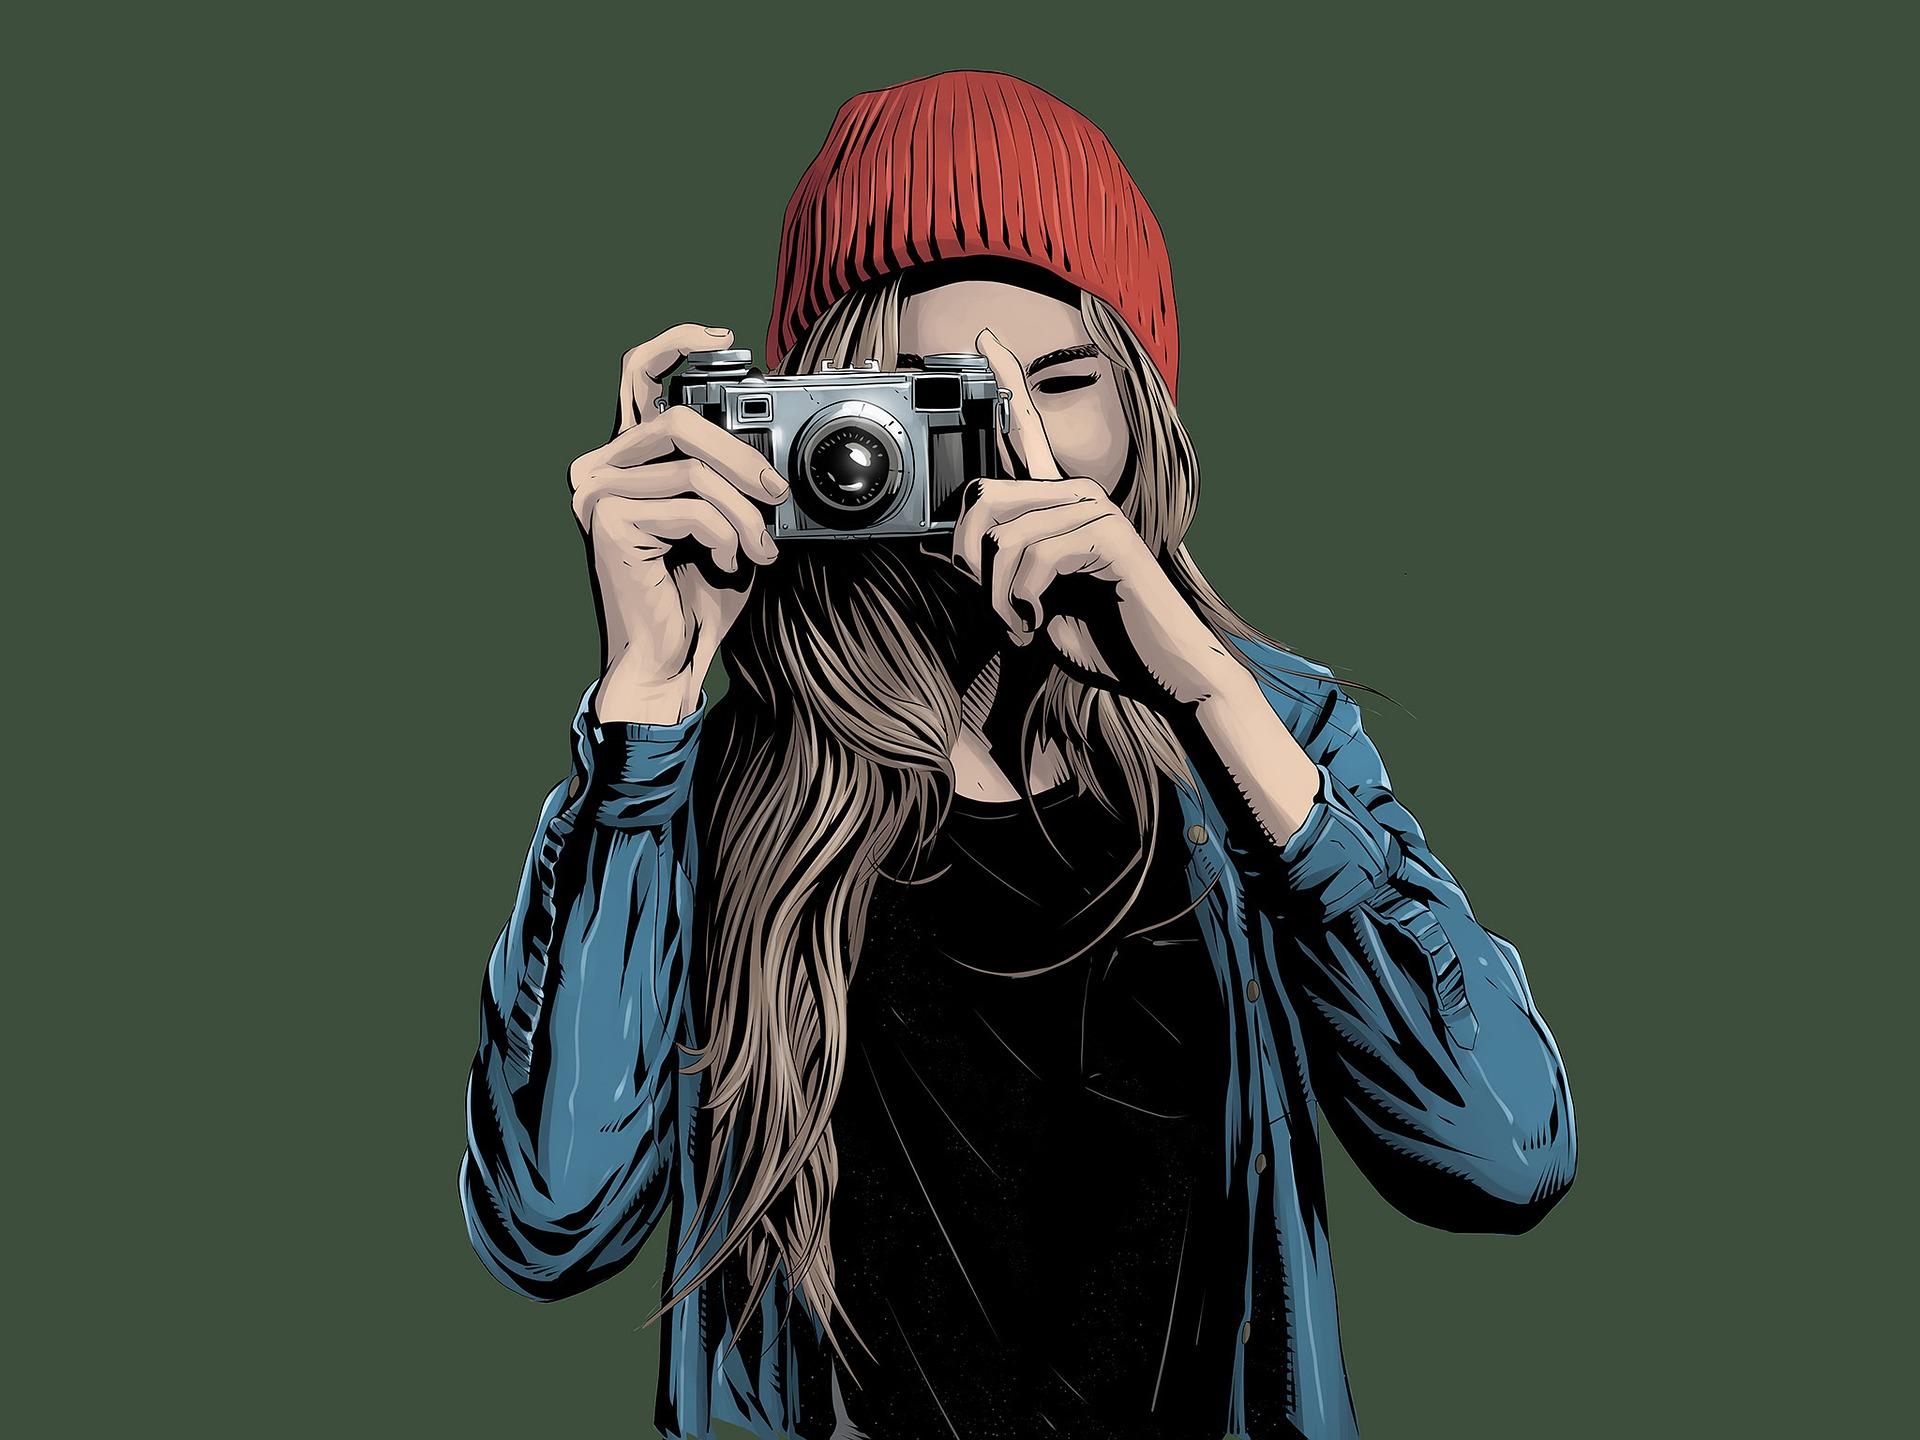 Illustierte junge Frau mit Fotokamera